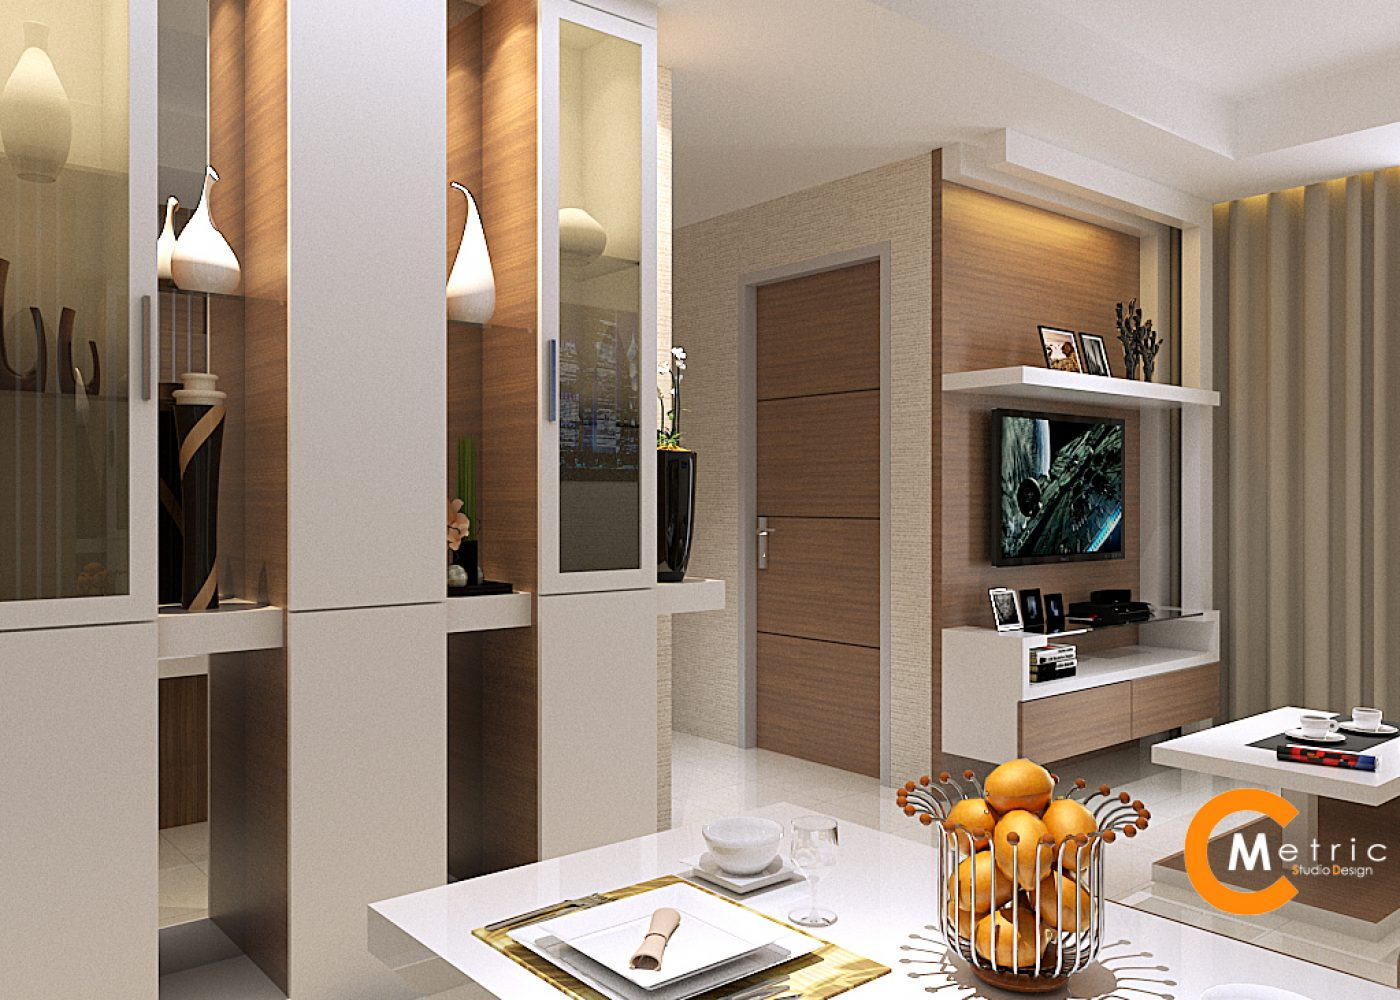 jasa render sketchup, jasa render 3d, jasa gambar 3d, jasa render vray, jasa 3d model perumahan, jasa render interior apartemen